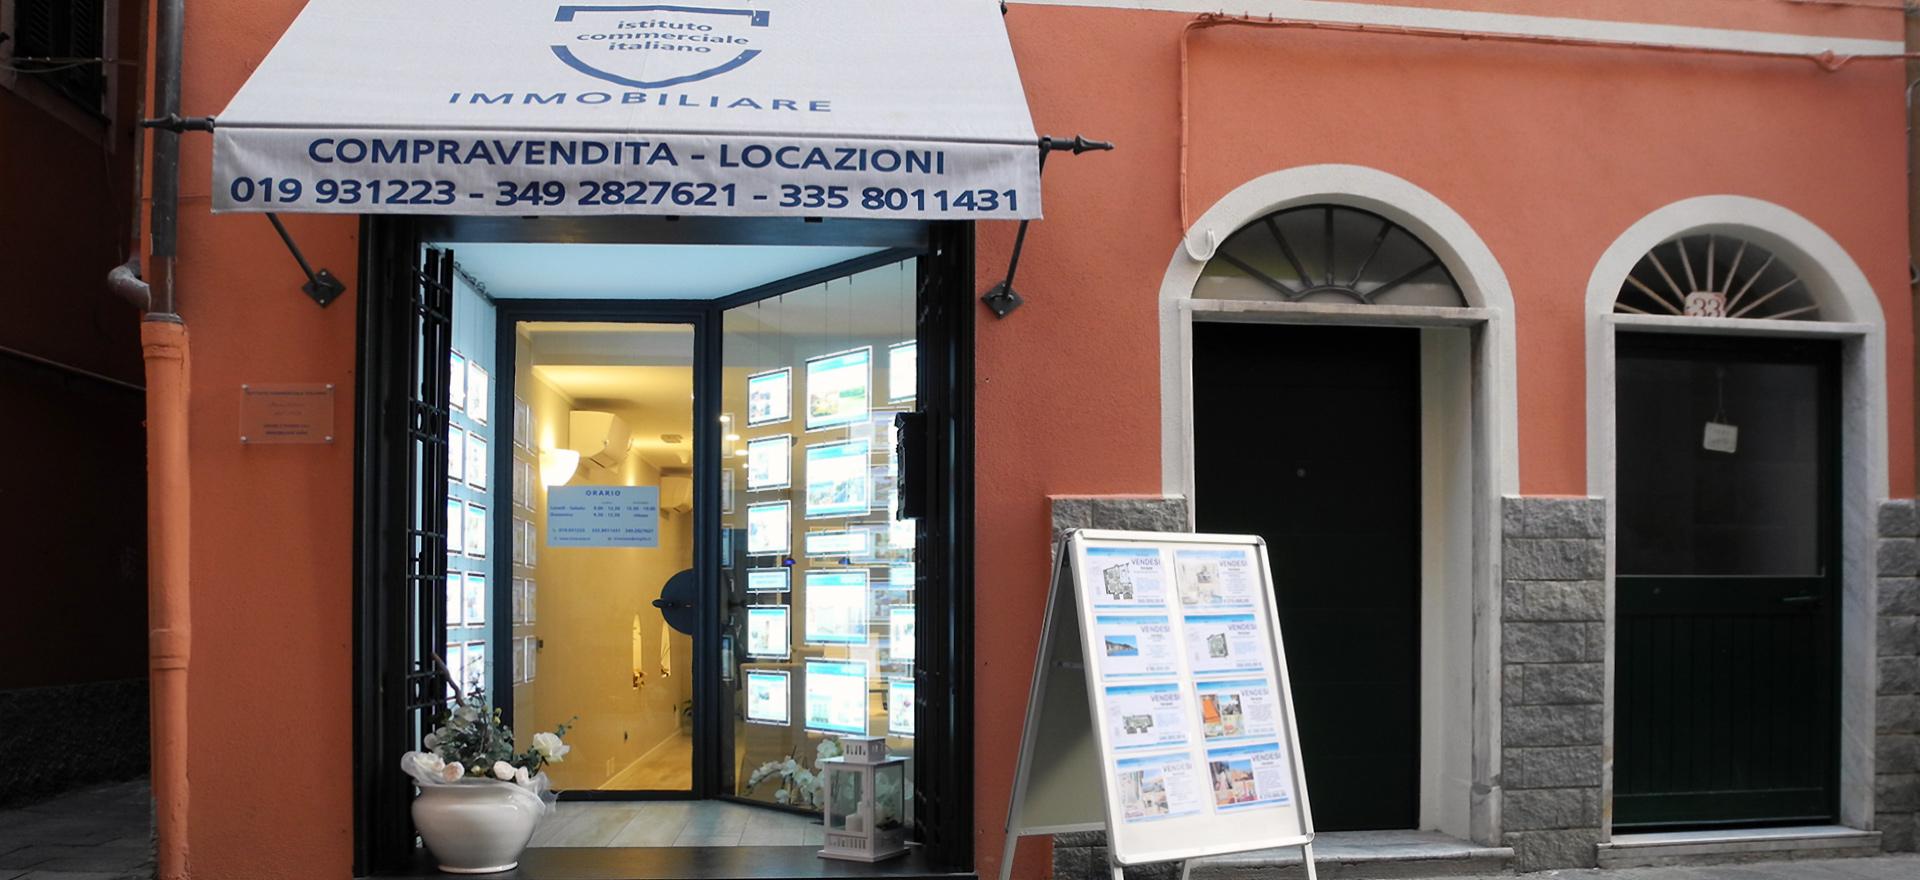 Agenzie Immobiliari Varazze ici varazze - agenzia immobiliare